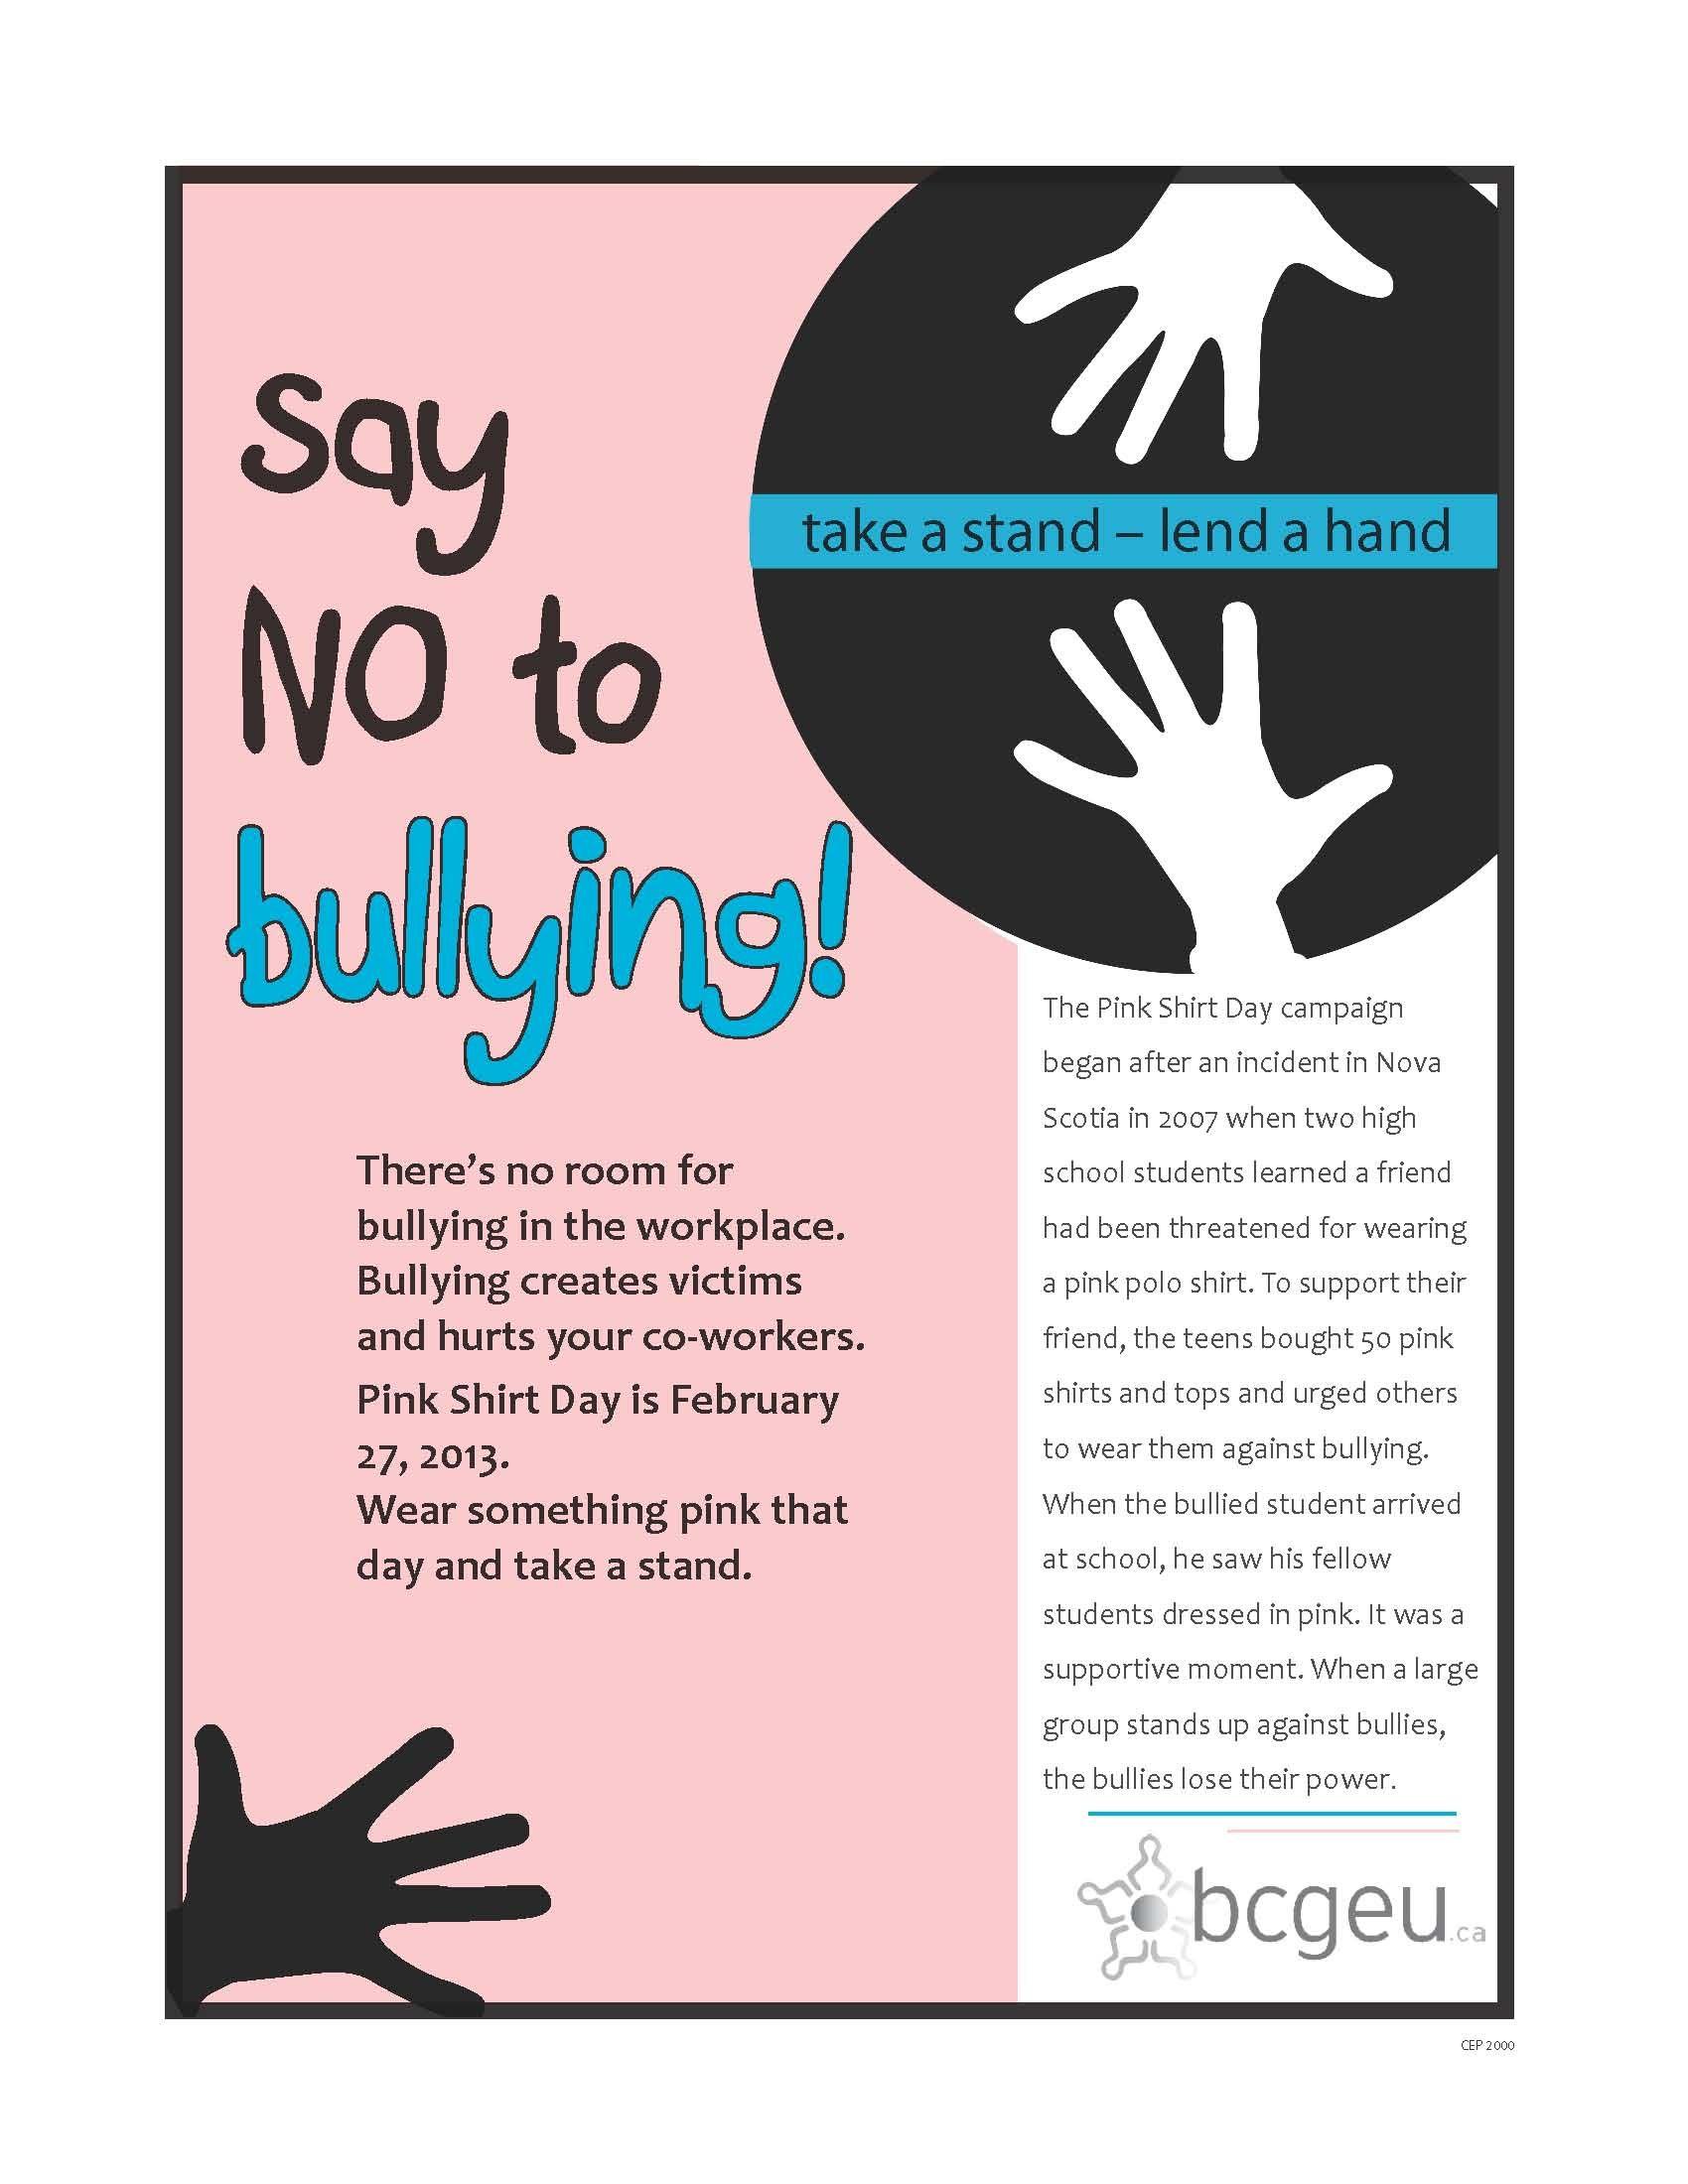 Antibullying bcgeu poster workplace bullying safe